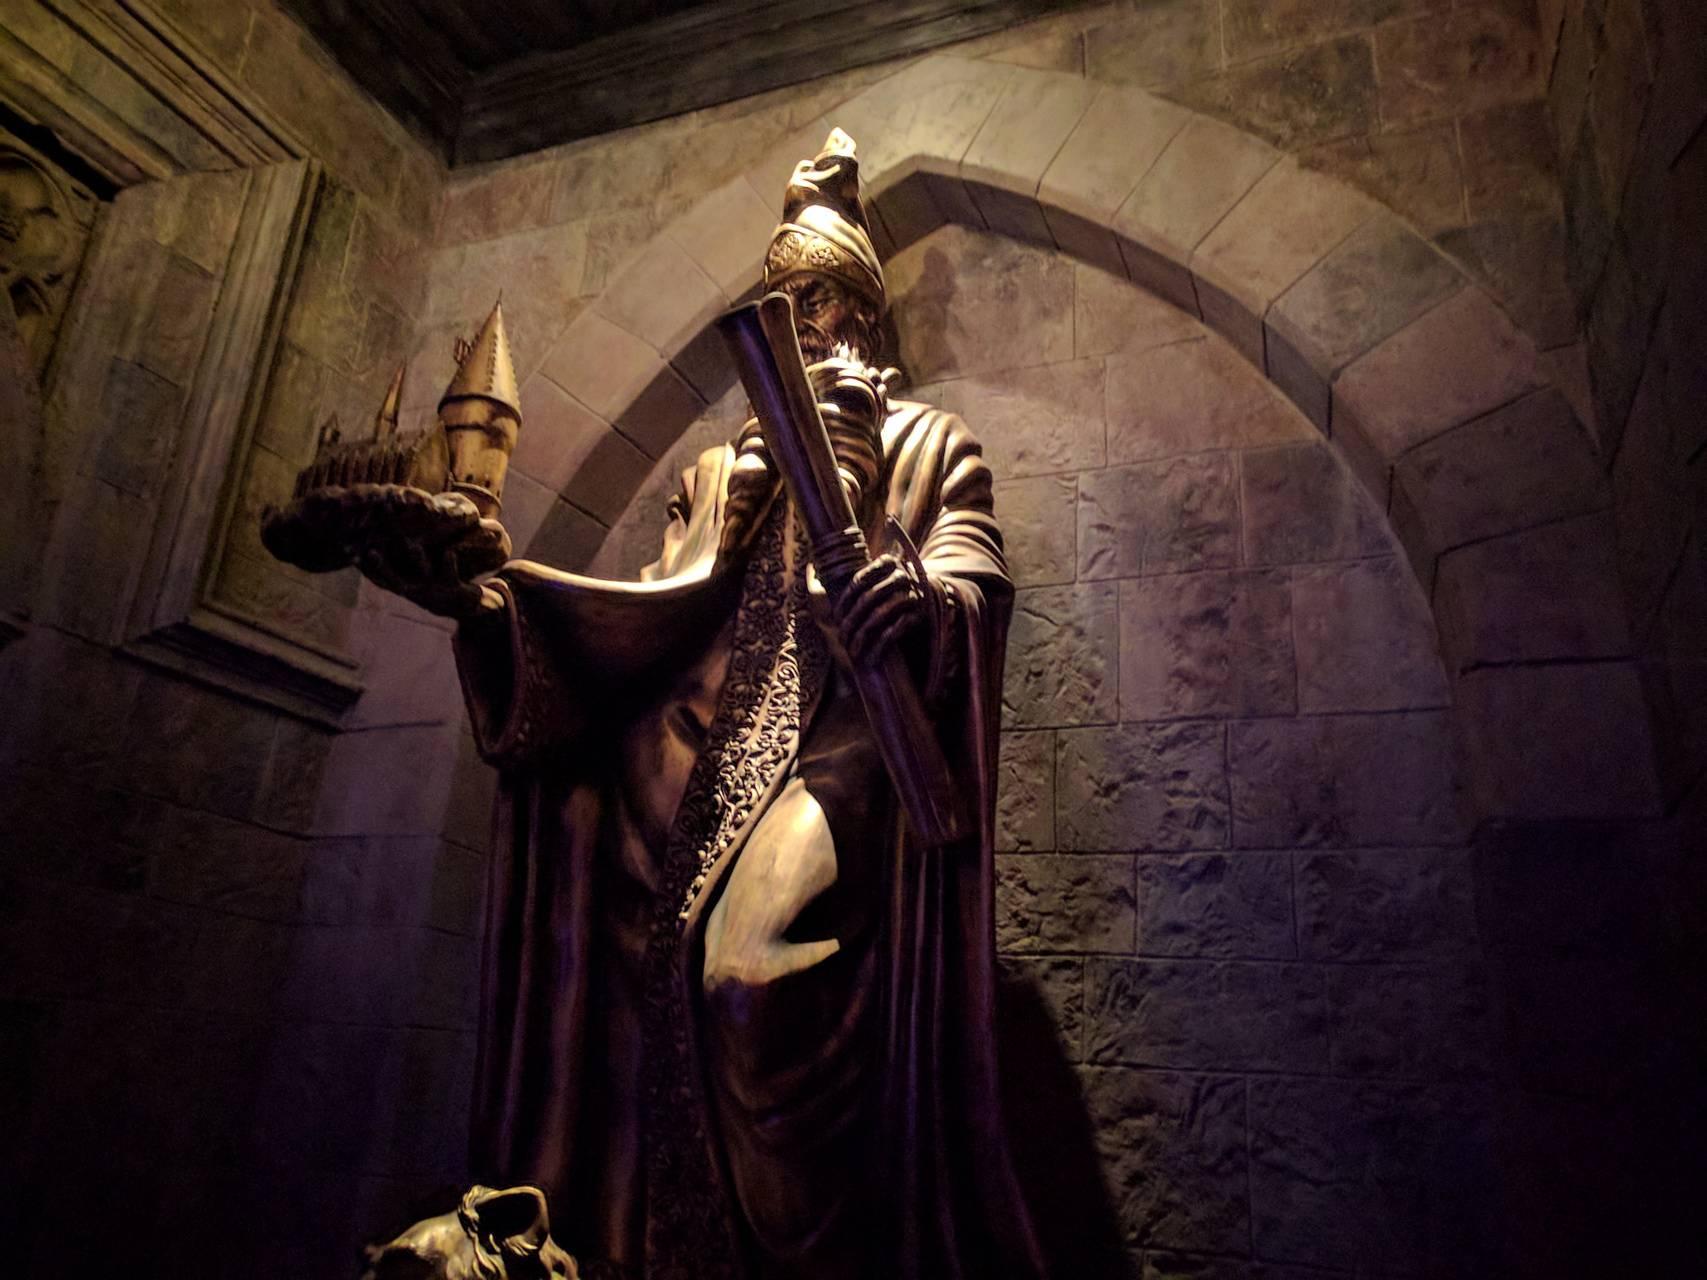 Hogwarts statue